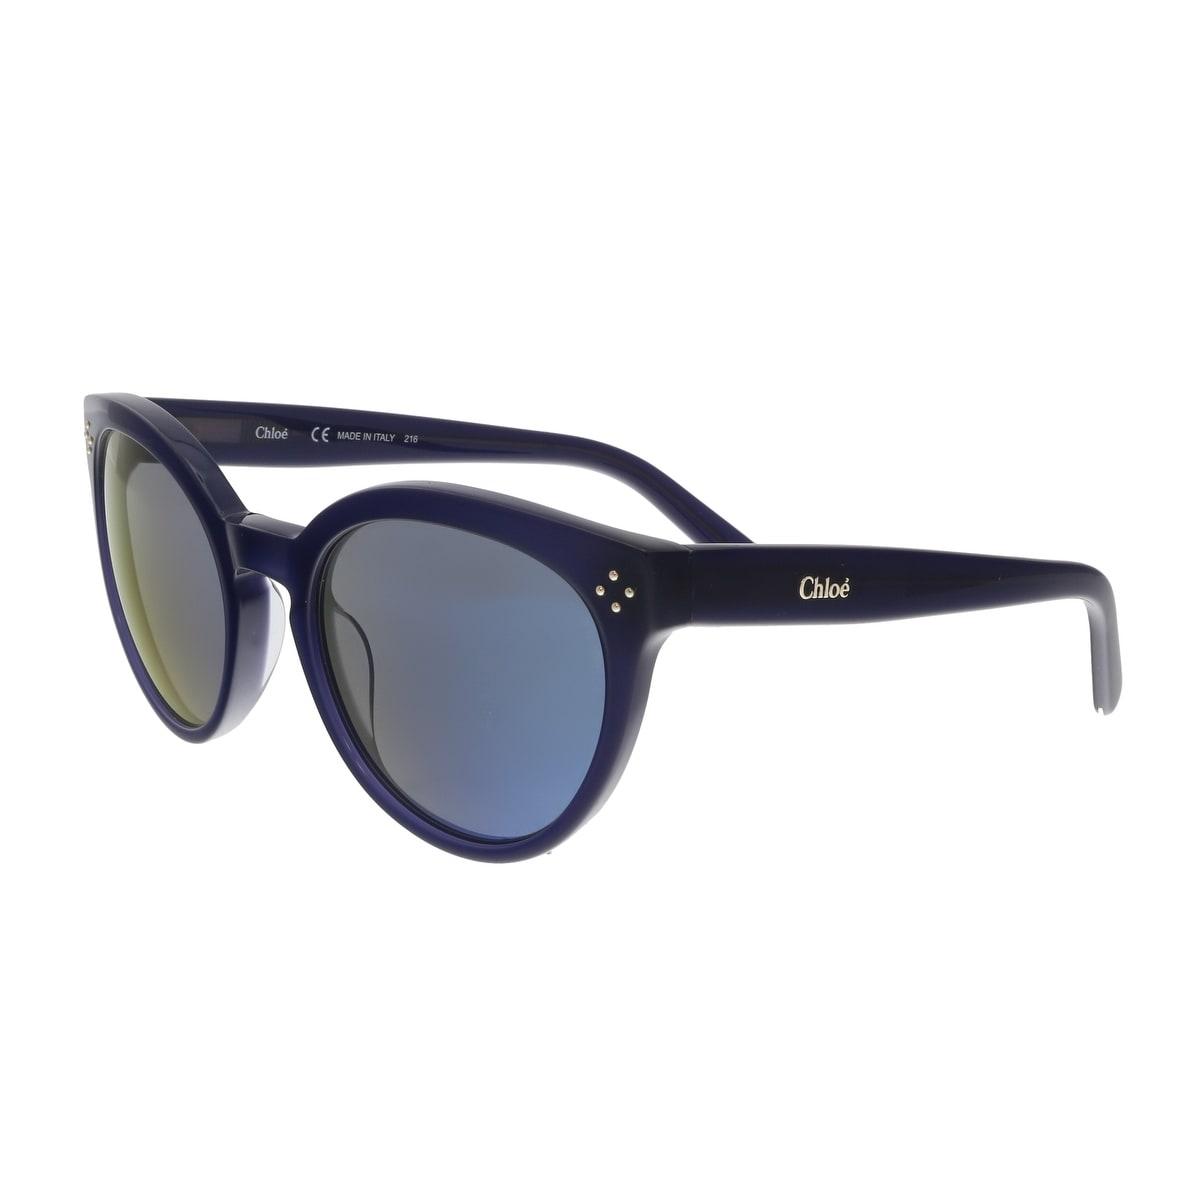 2a10b2342ba9 Shop Chloe CE691S 424 Blue Cat Eye Sunglasses - 54-21-135 - Free ...